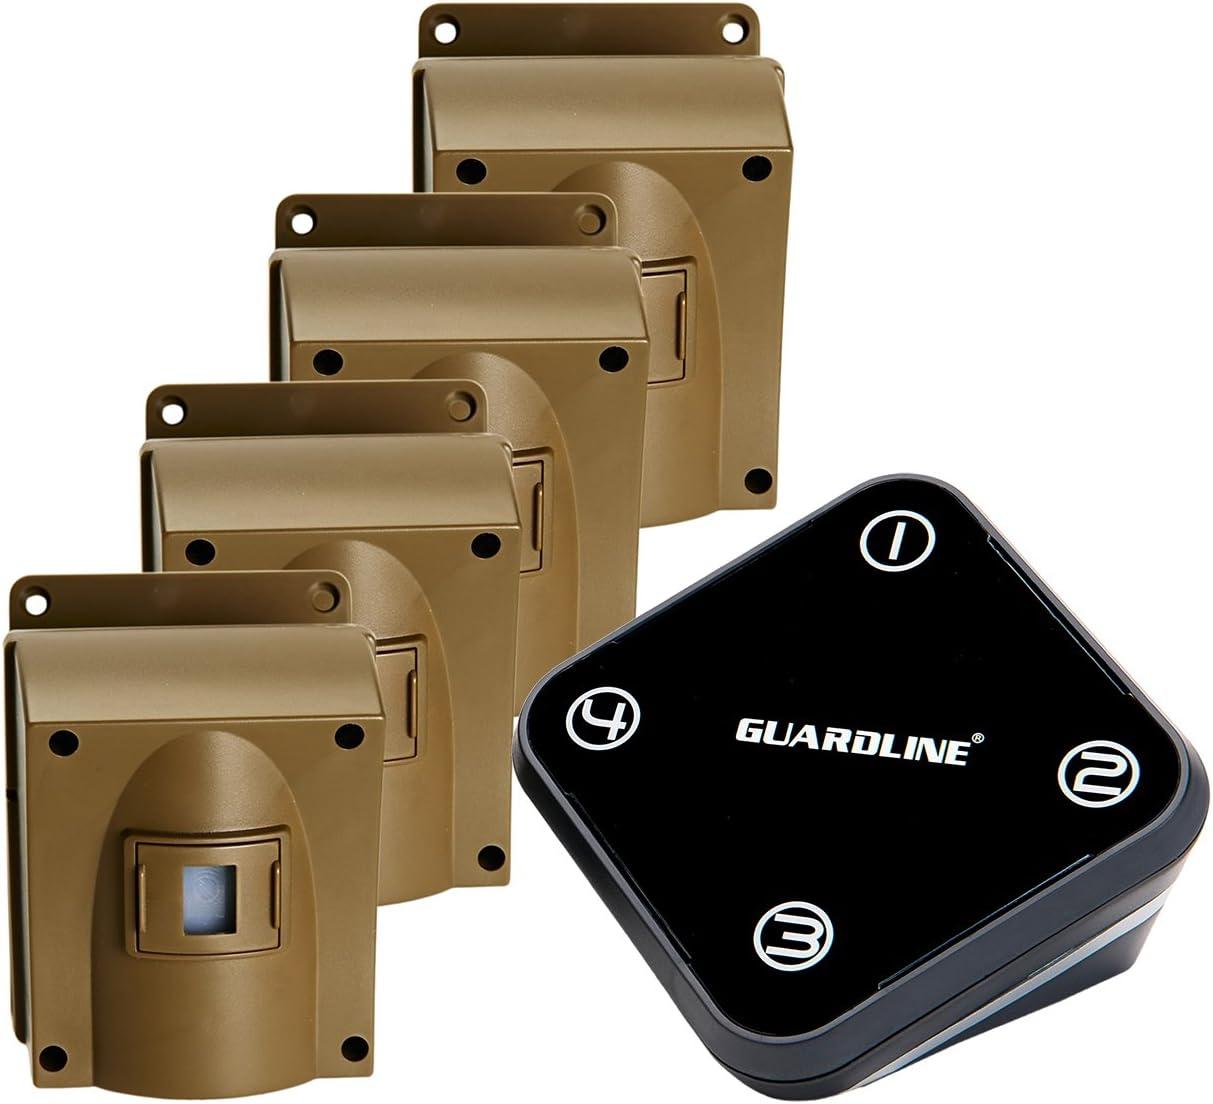 Guardline Wireless Driveway Alarm w Four Sensors Kit Outdoor Weather Resistant Motion Sensor Detector- Best DIY Security Alert System- Protect Home, Perimeter, Yard, Garage, Gate, Pool